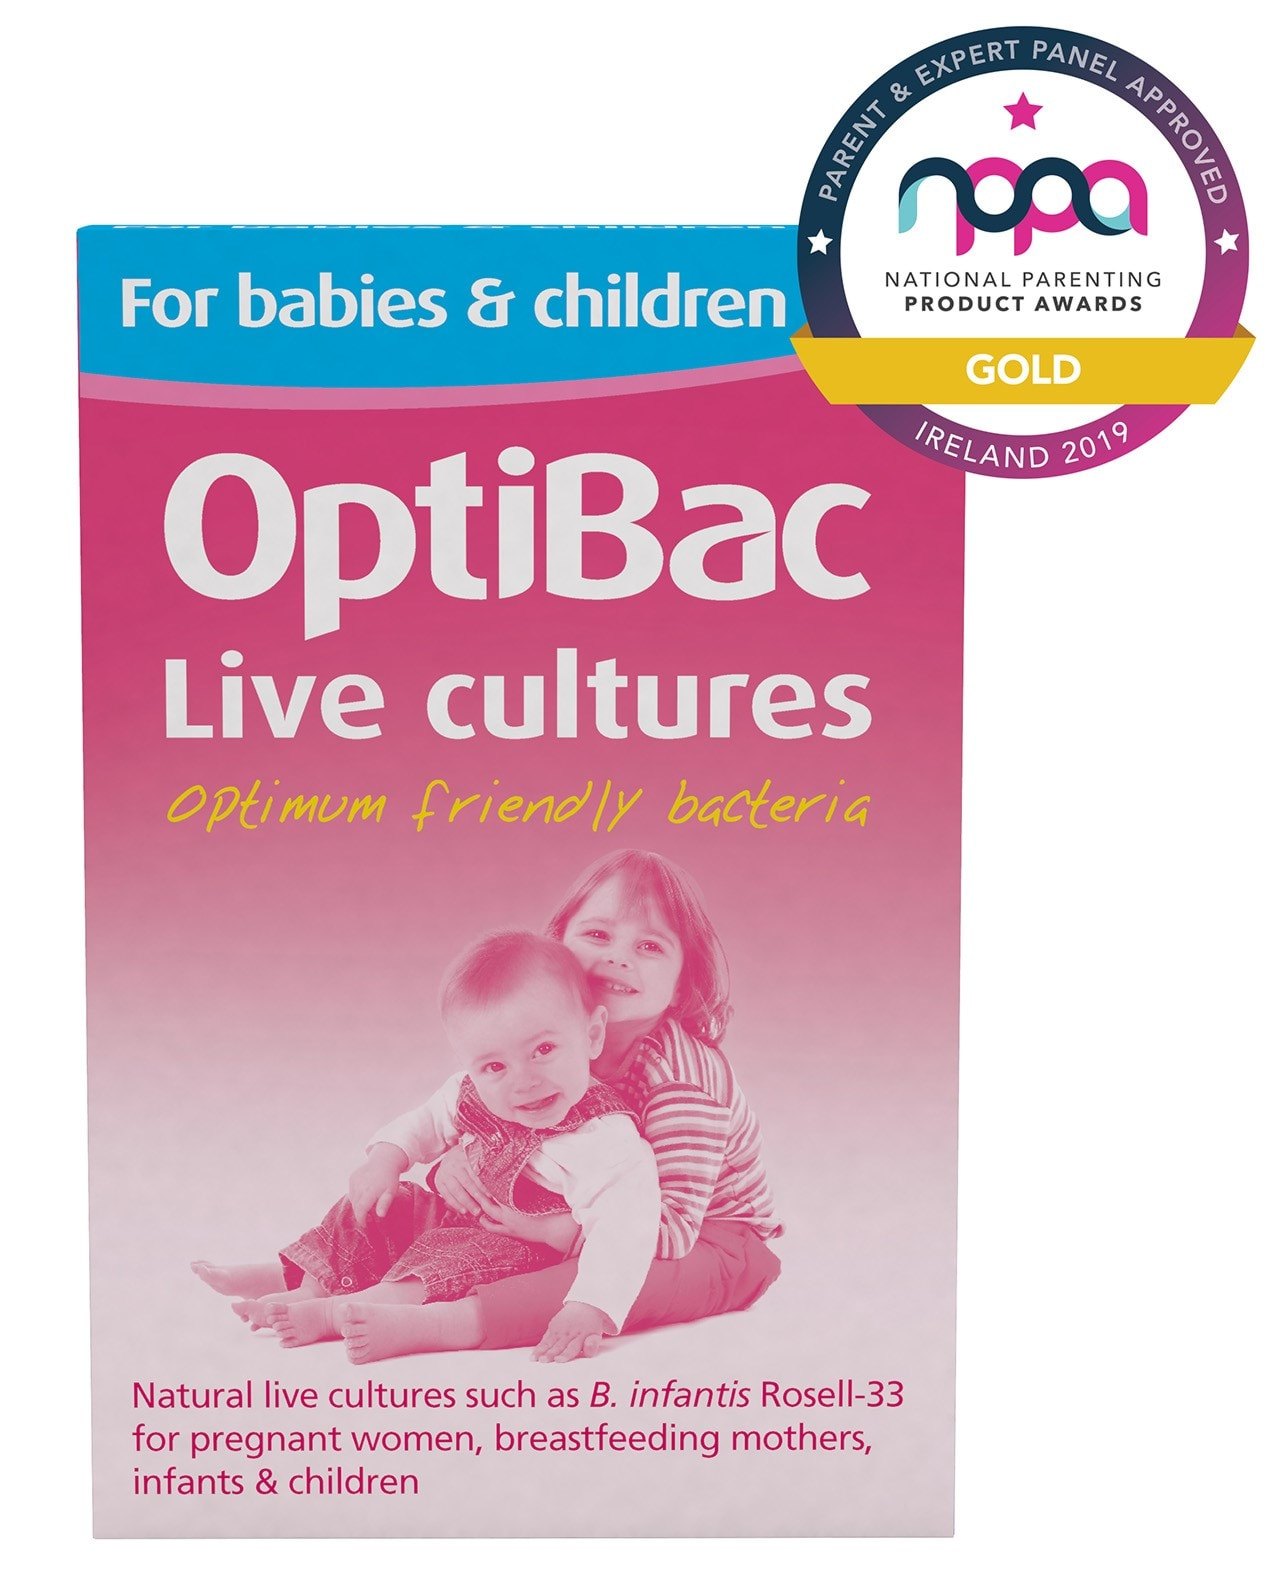 Optibac 'For babies & children' award 2019